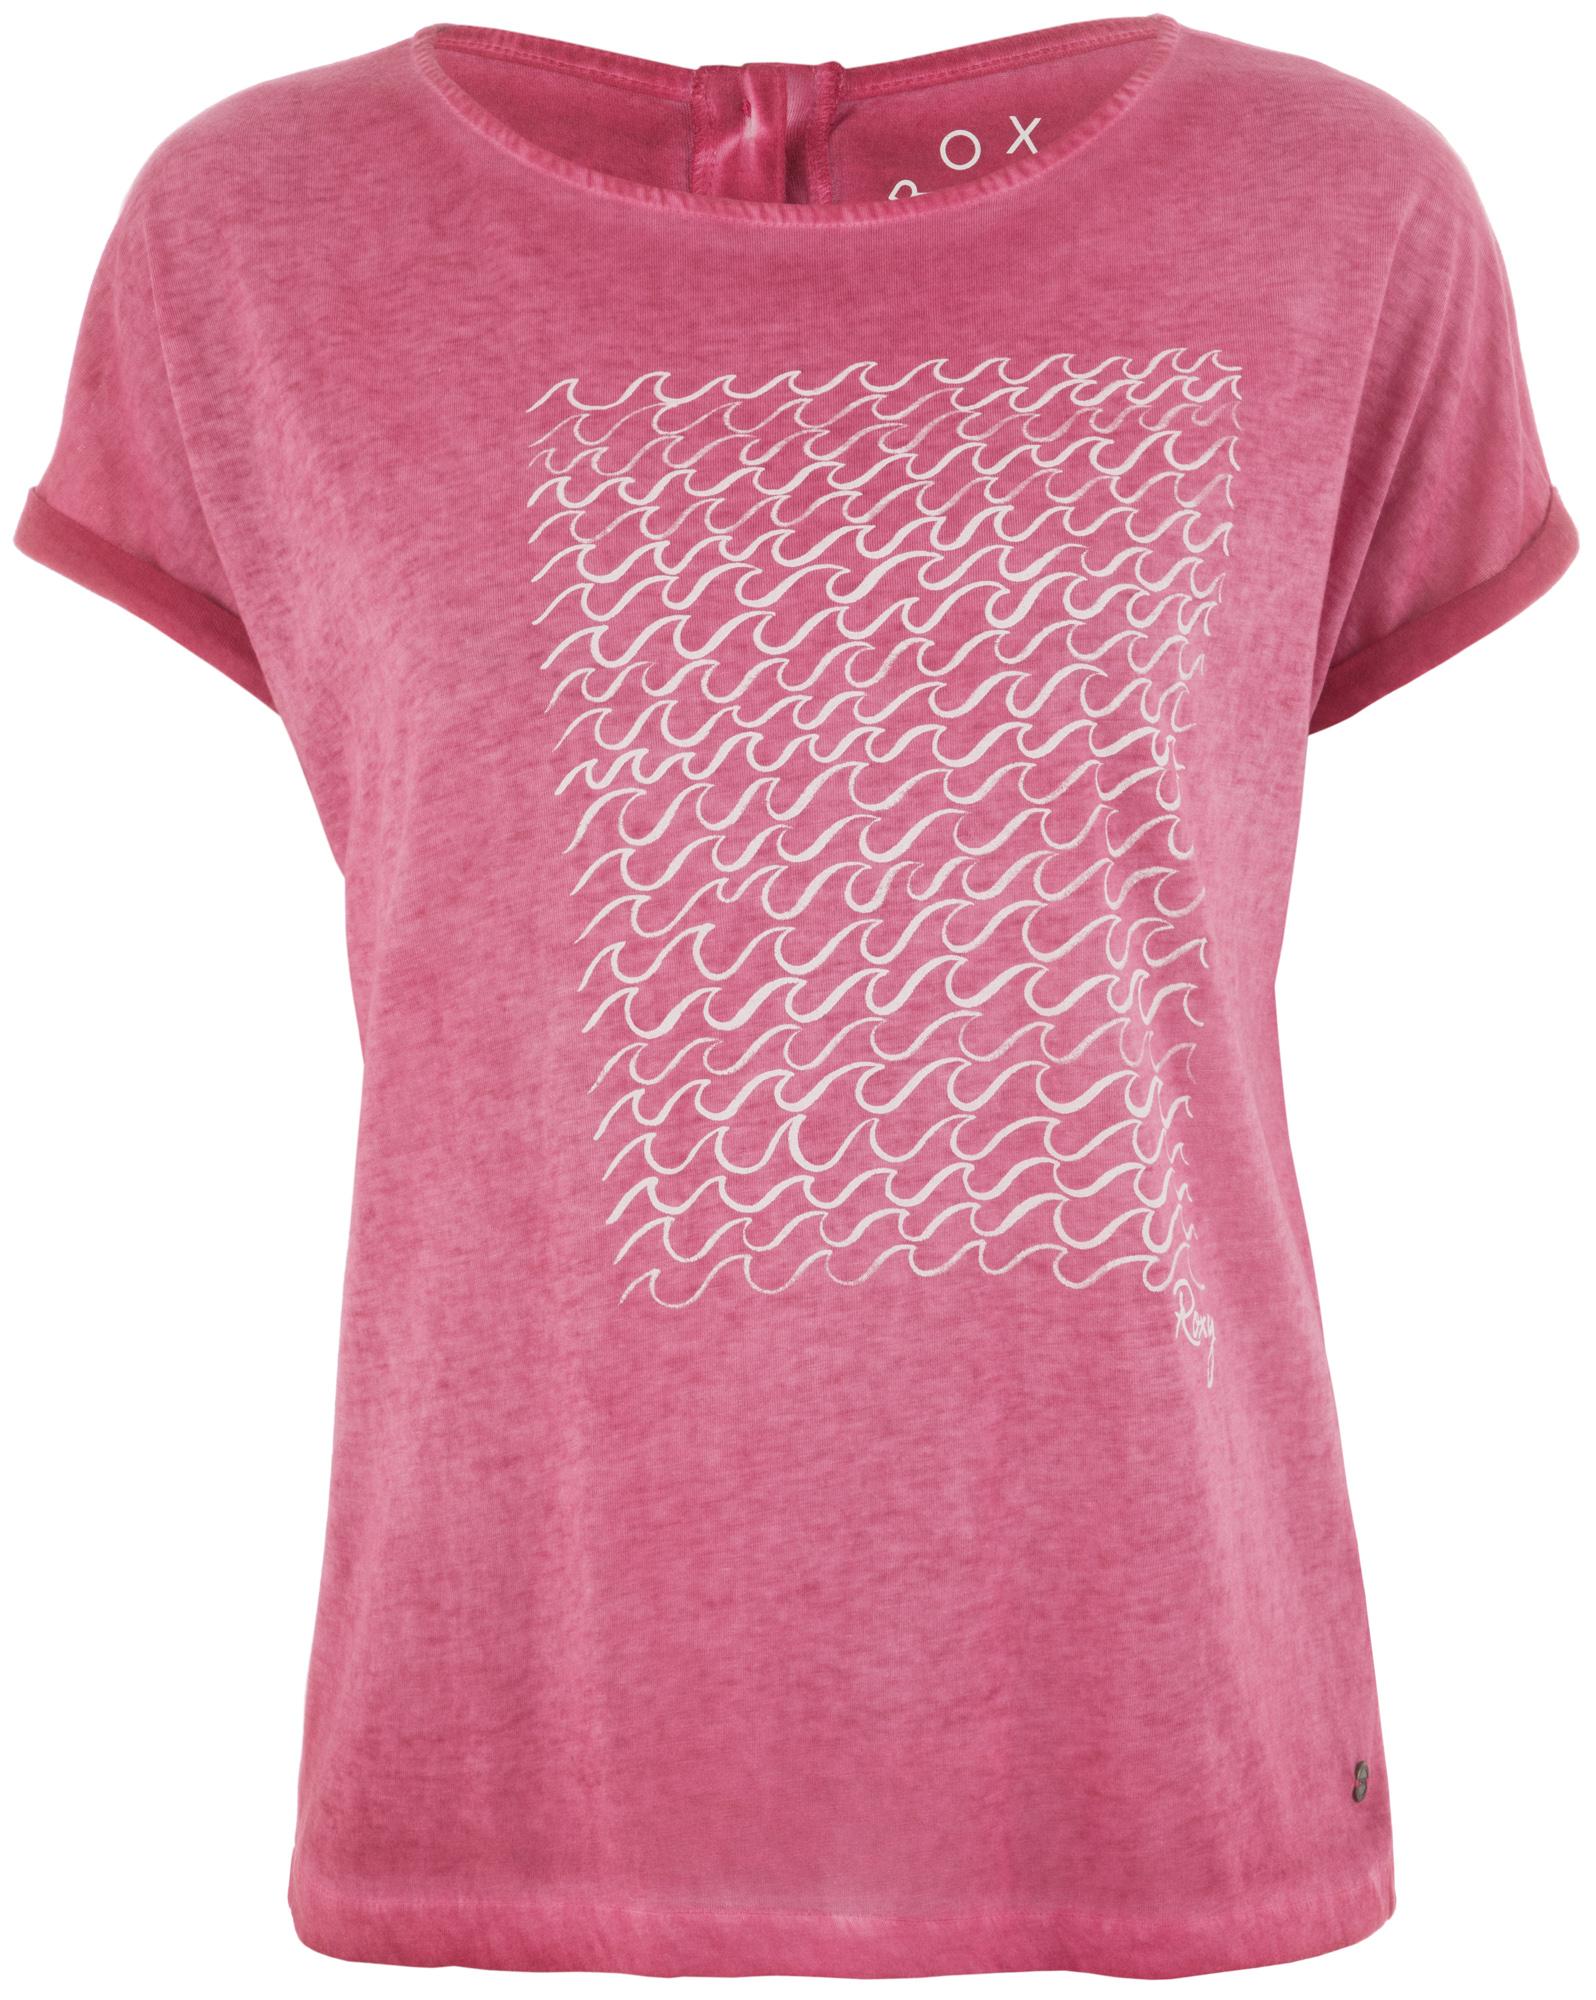 Roxy Футболка женская Roxy Summertime Happiness, размер 48-50 футболка детская roxy seeyouagainanch dress blues